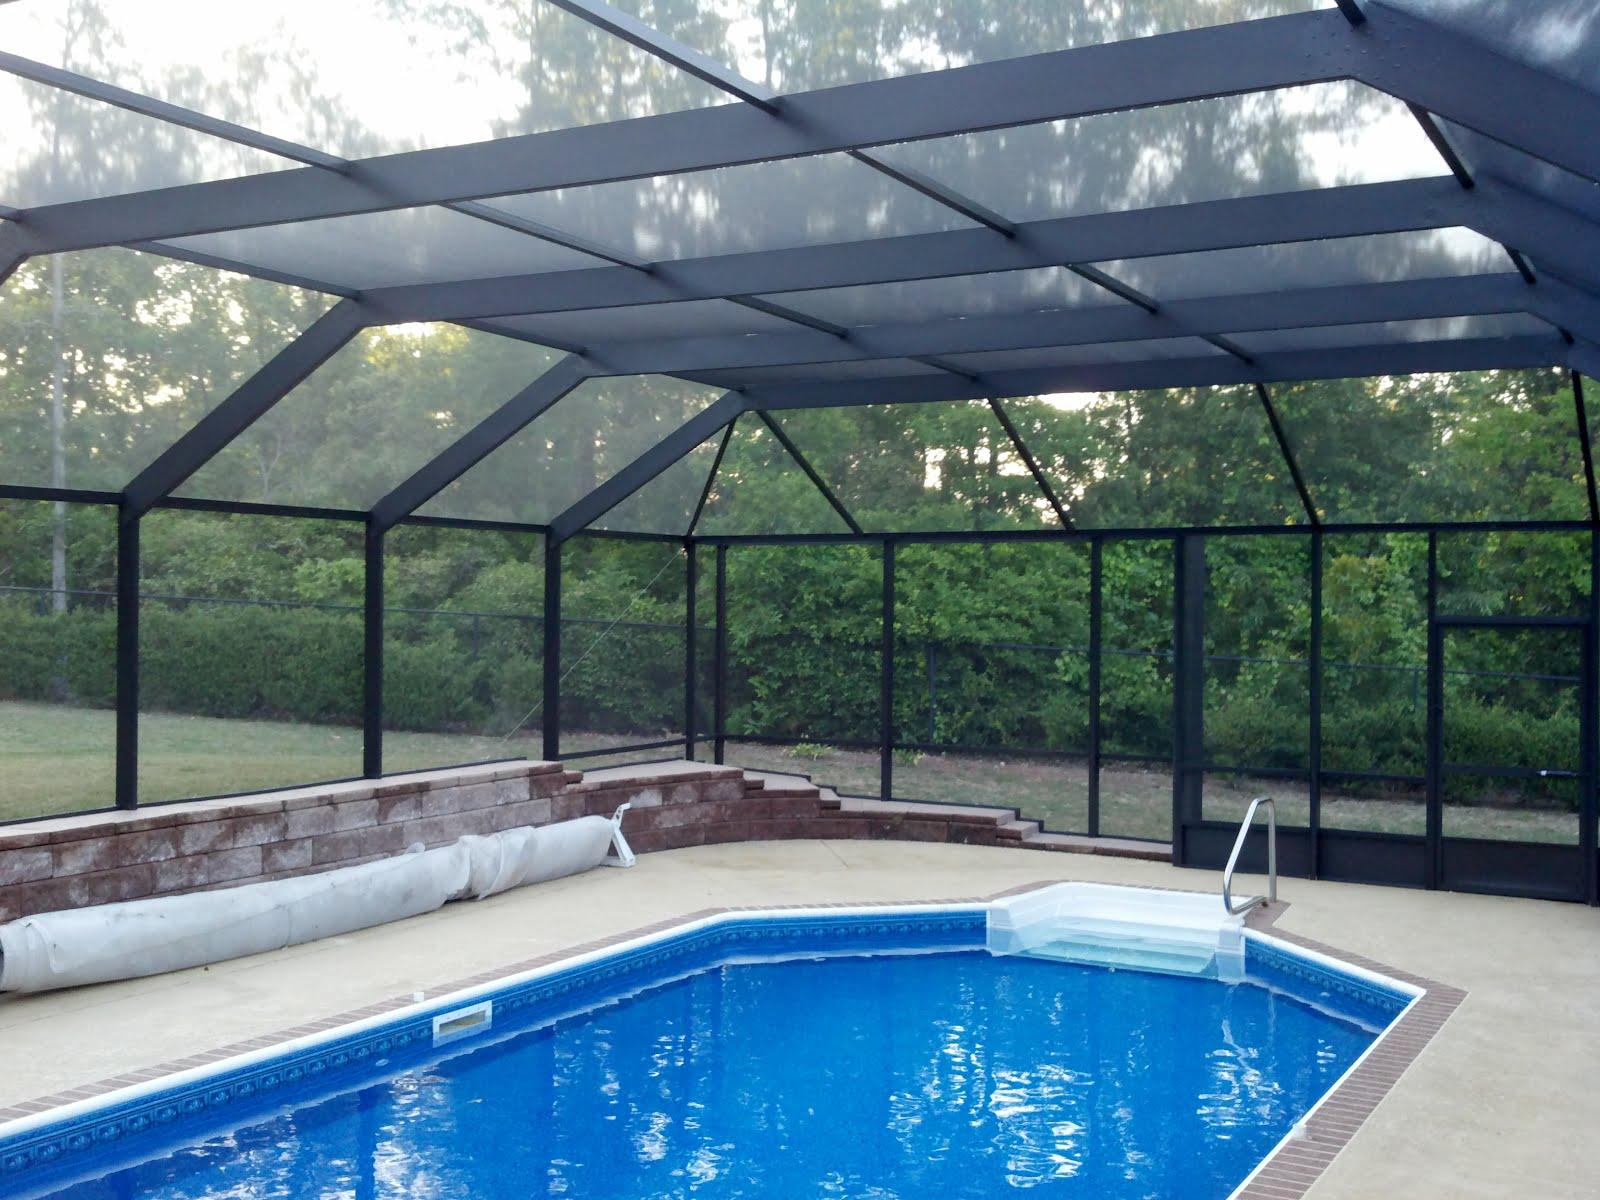 Pool Enclosures Usa Phenix City Alabama Pool Enclosure